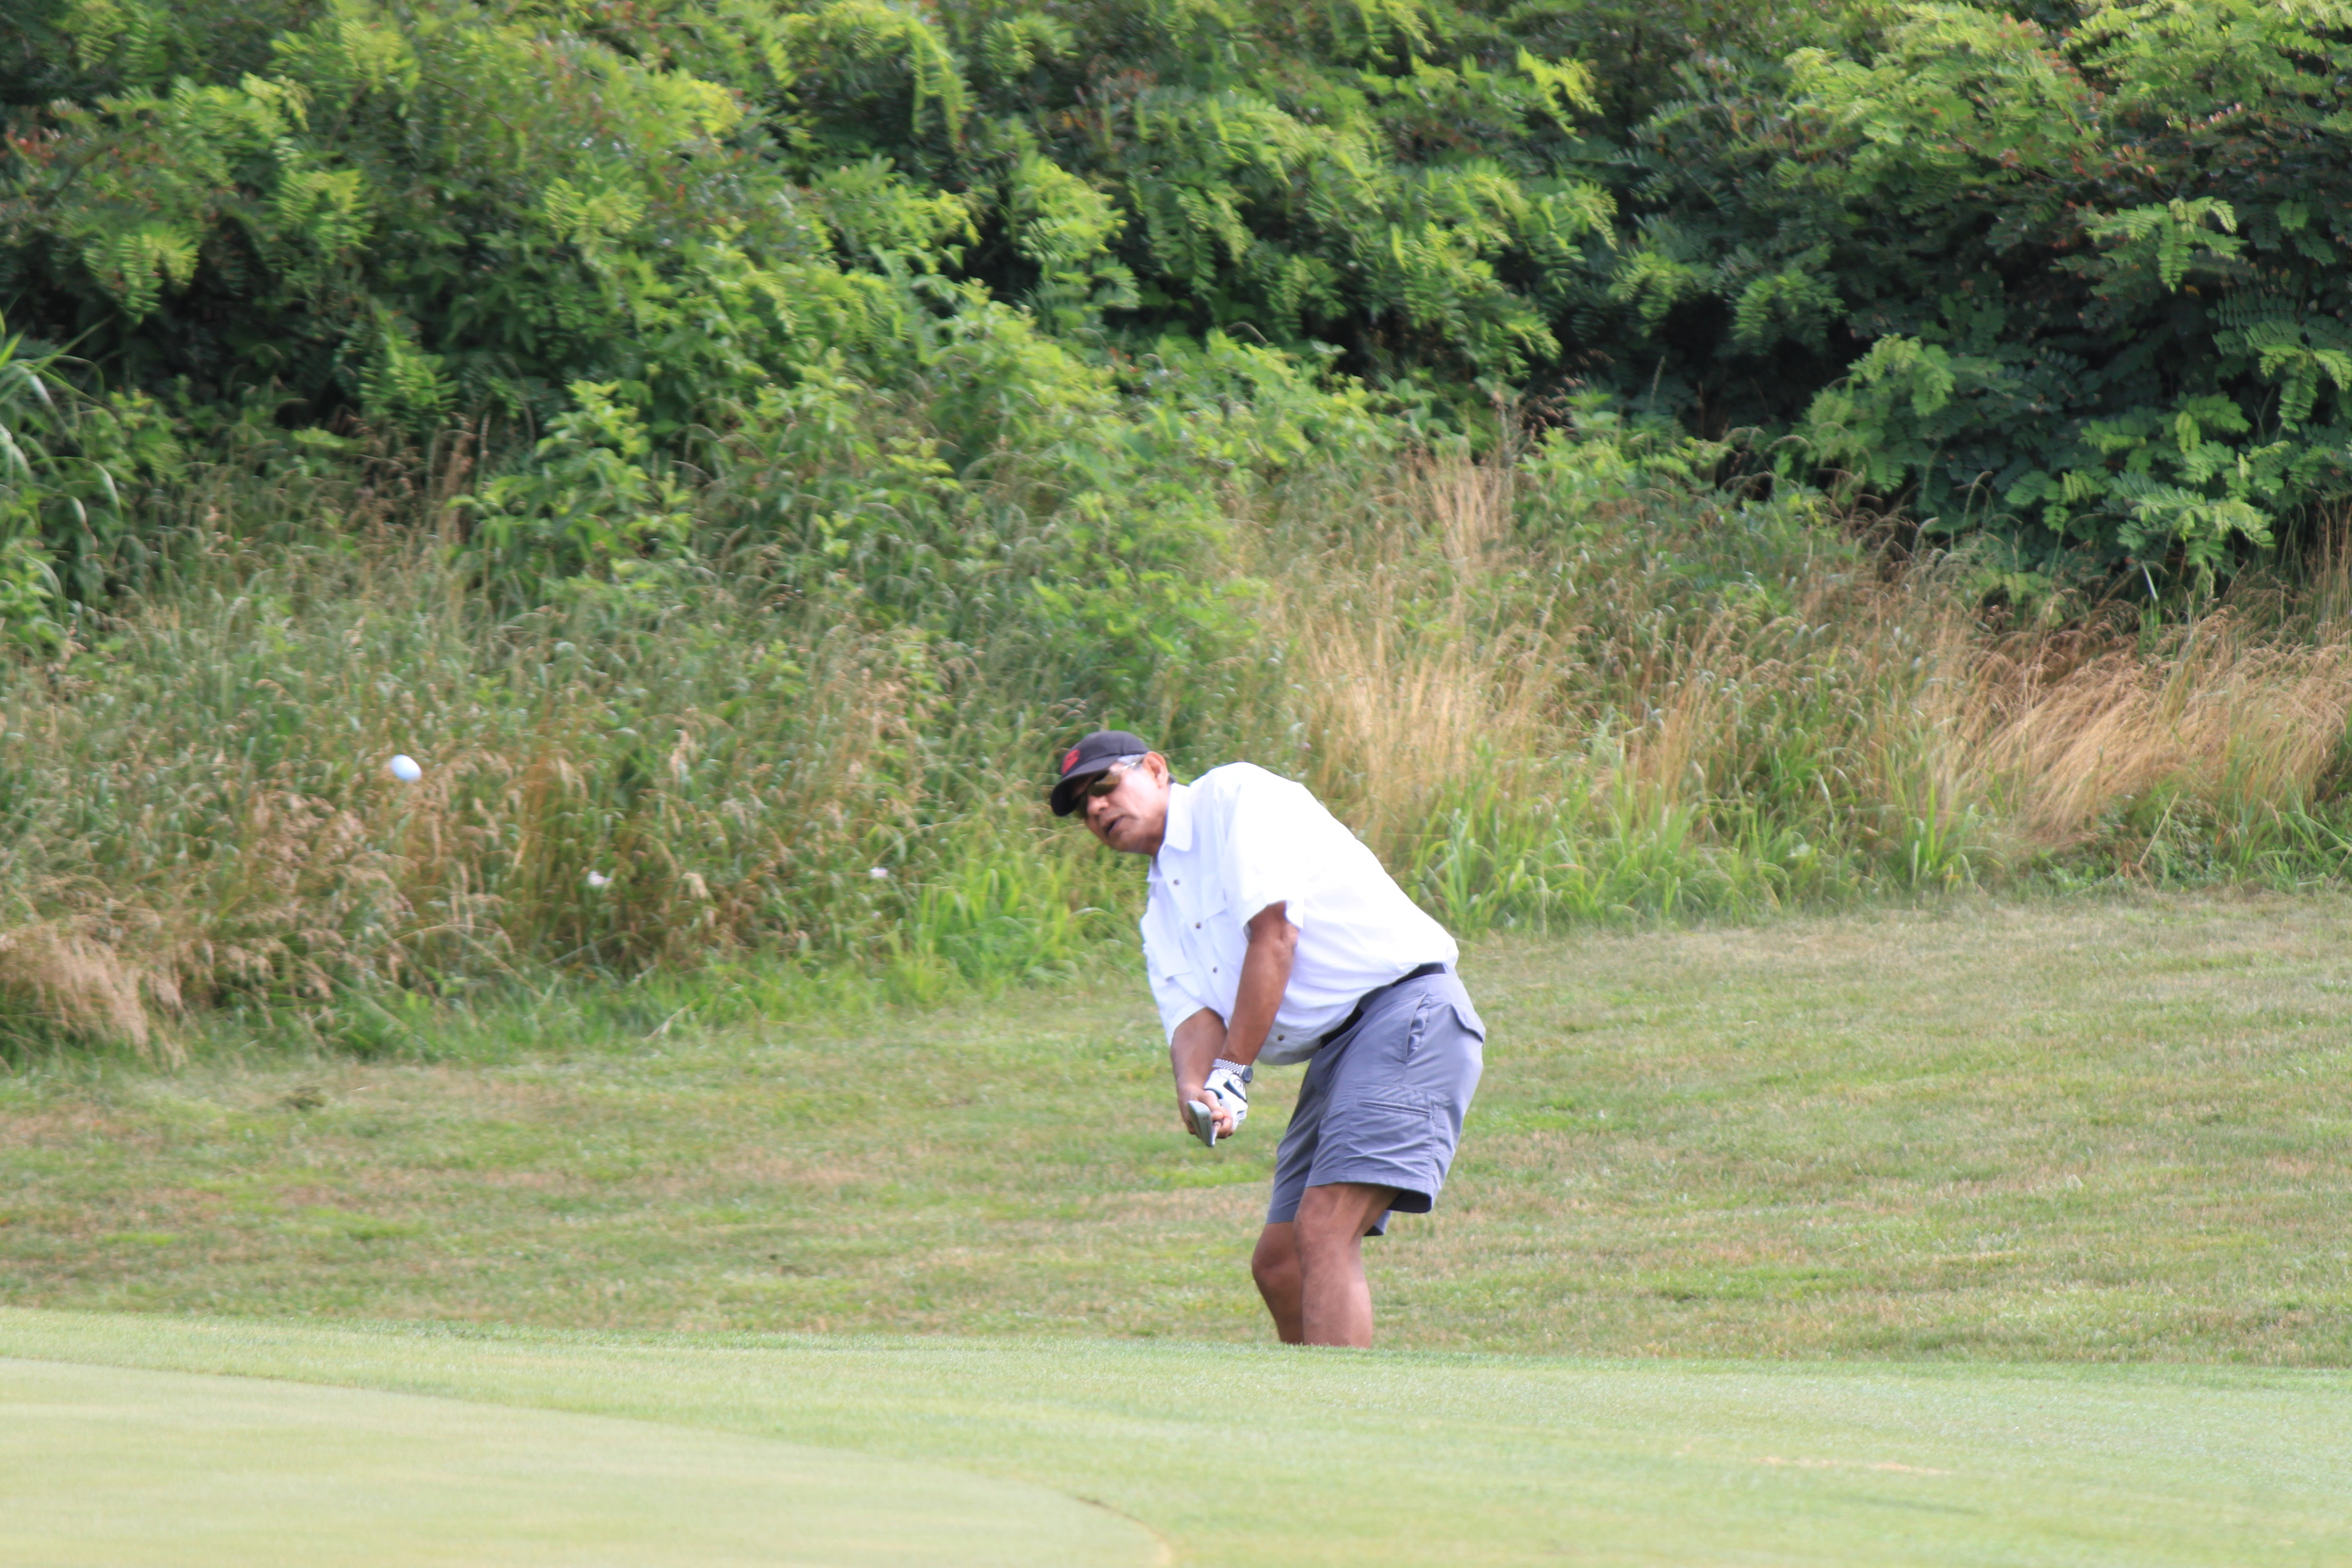 Dennis_Fitzgerald_Golf_Tournament_2011_IMG_3426.JPG